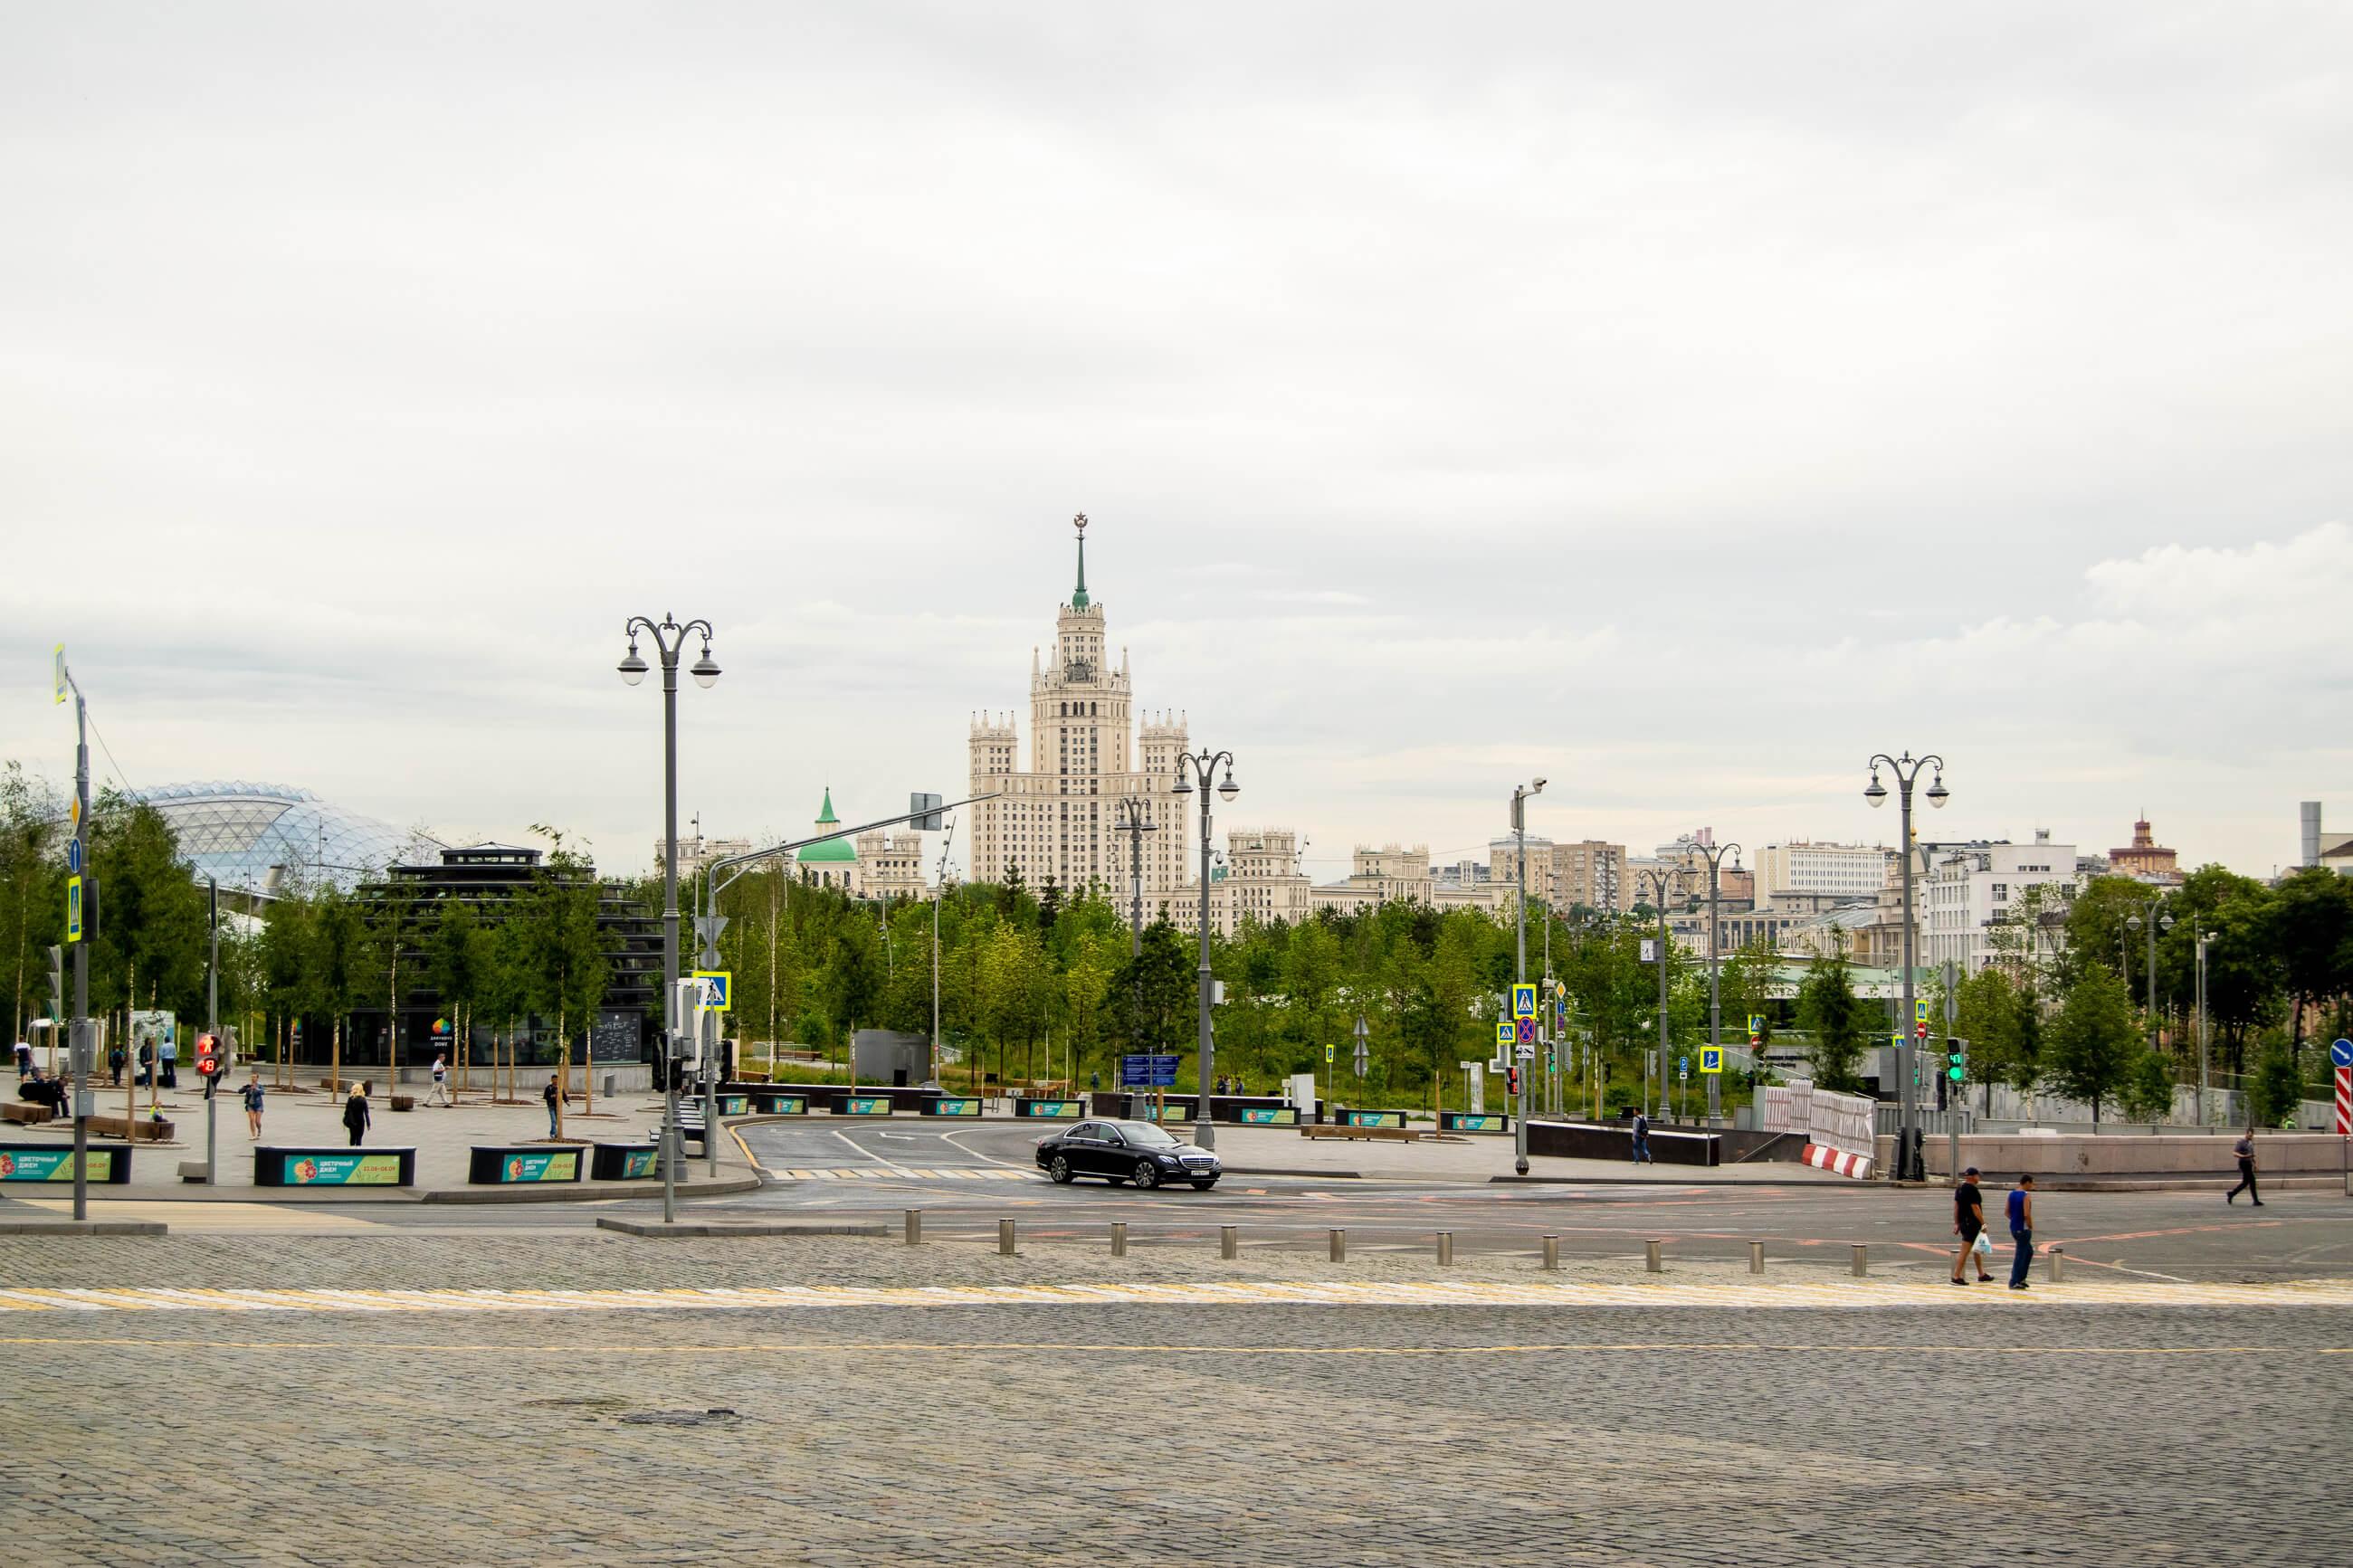 https://bubo.sk/uploads/galleries/5055/martinlipinsky_rusko_moskva_dsc0365-2-2.jpg